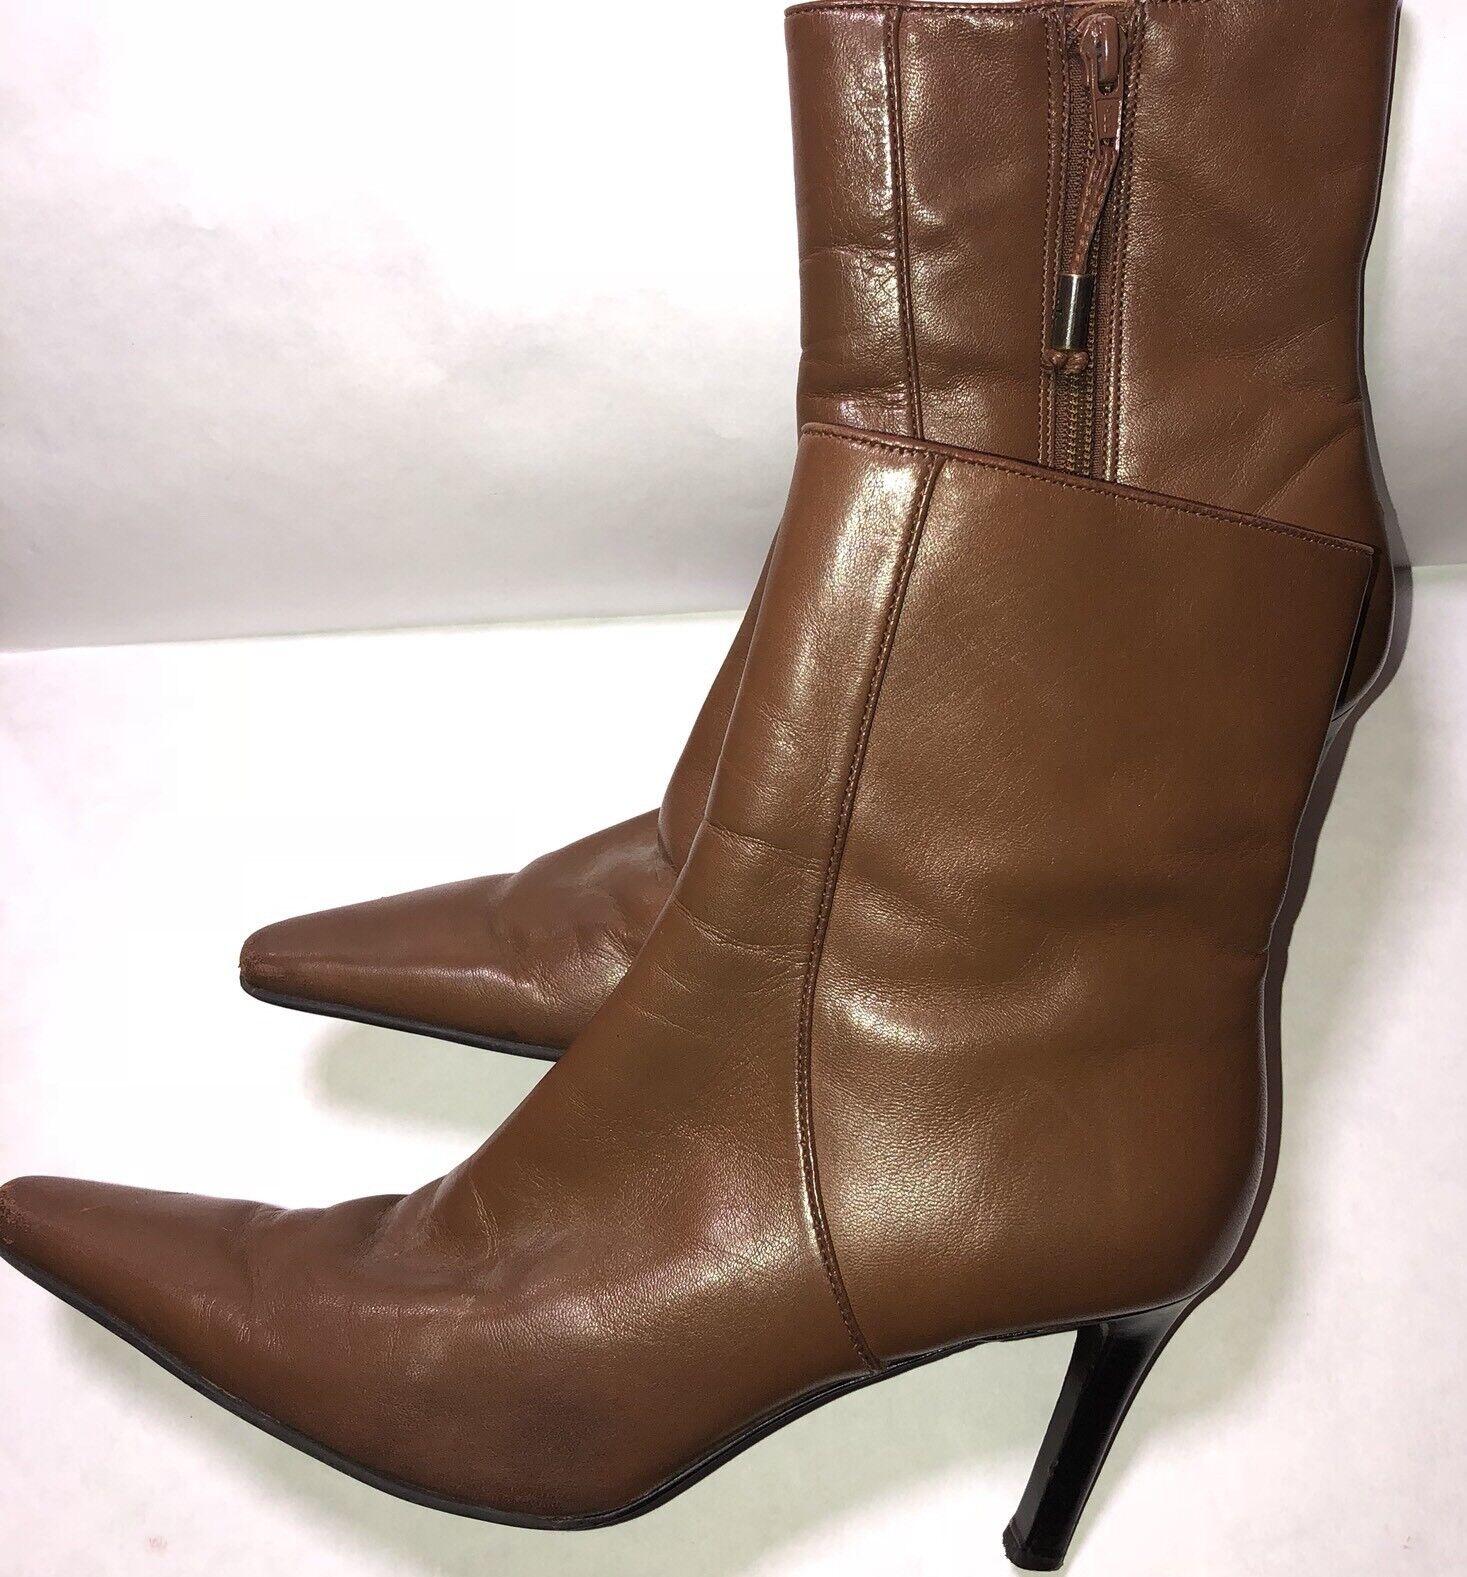 Ralph Lauren Women's Caramel Leather Ankle Boots Square Toe GUC Size 9 Zipper